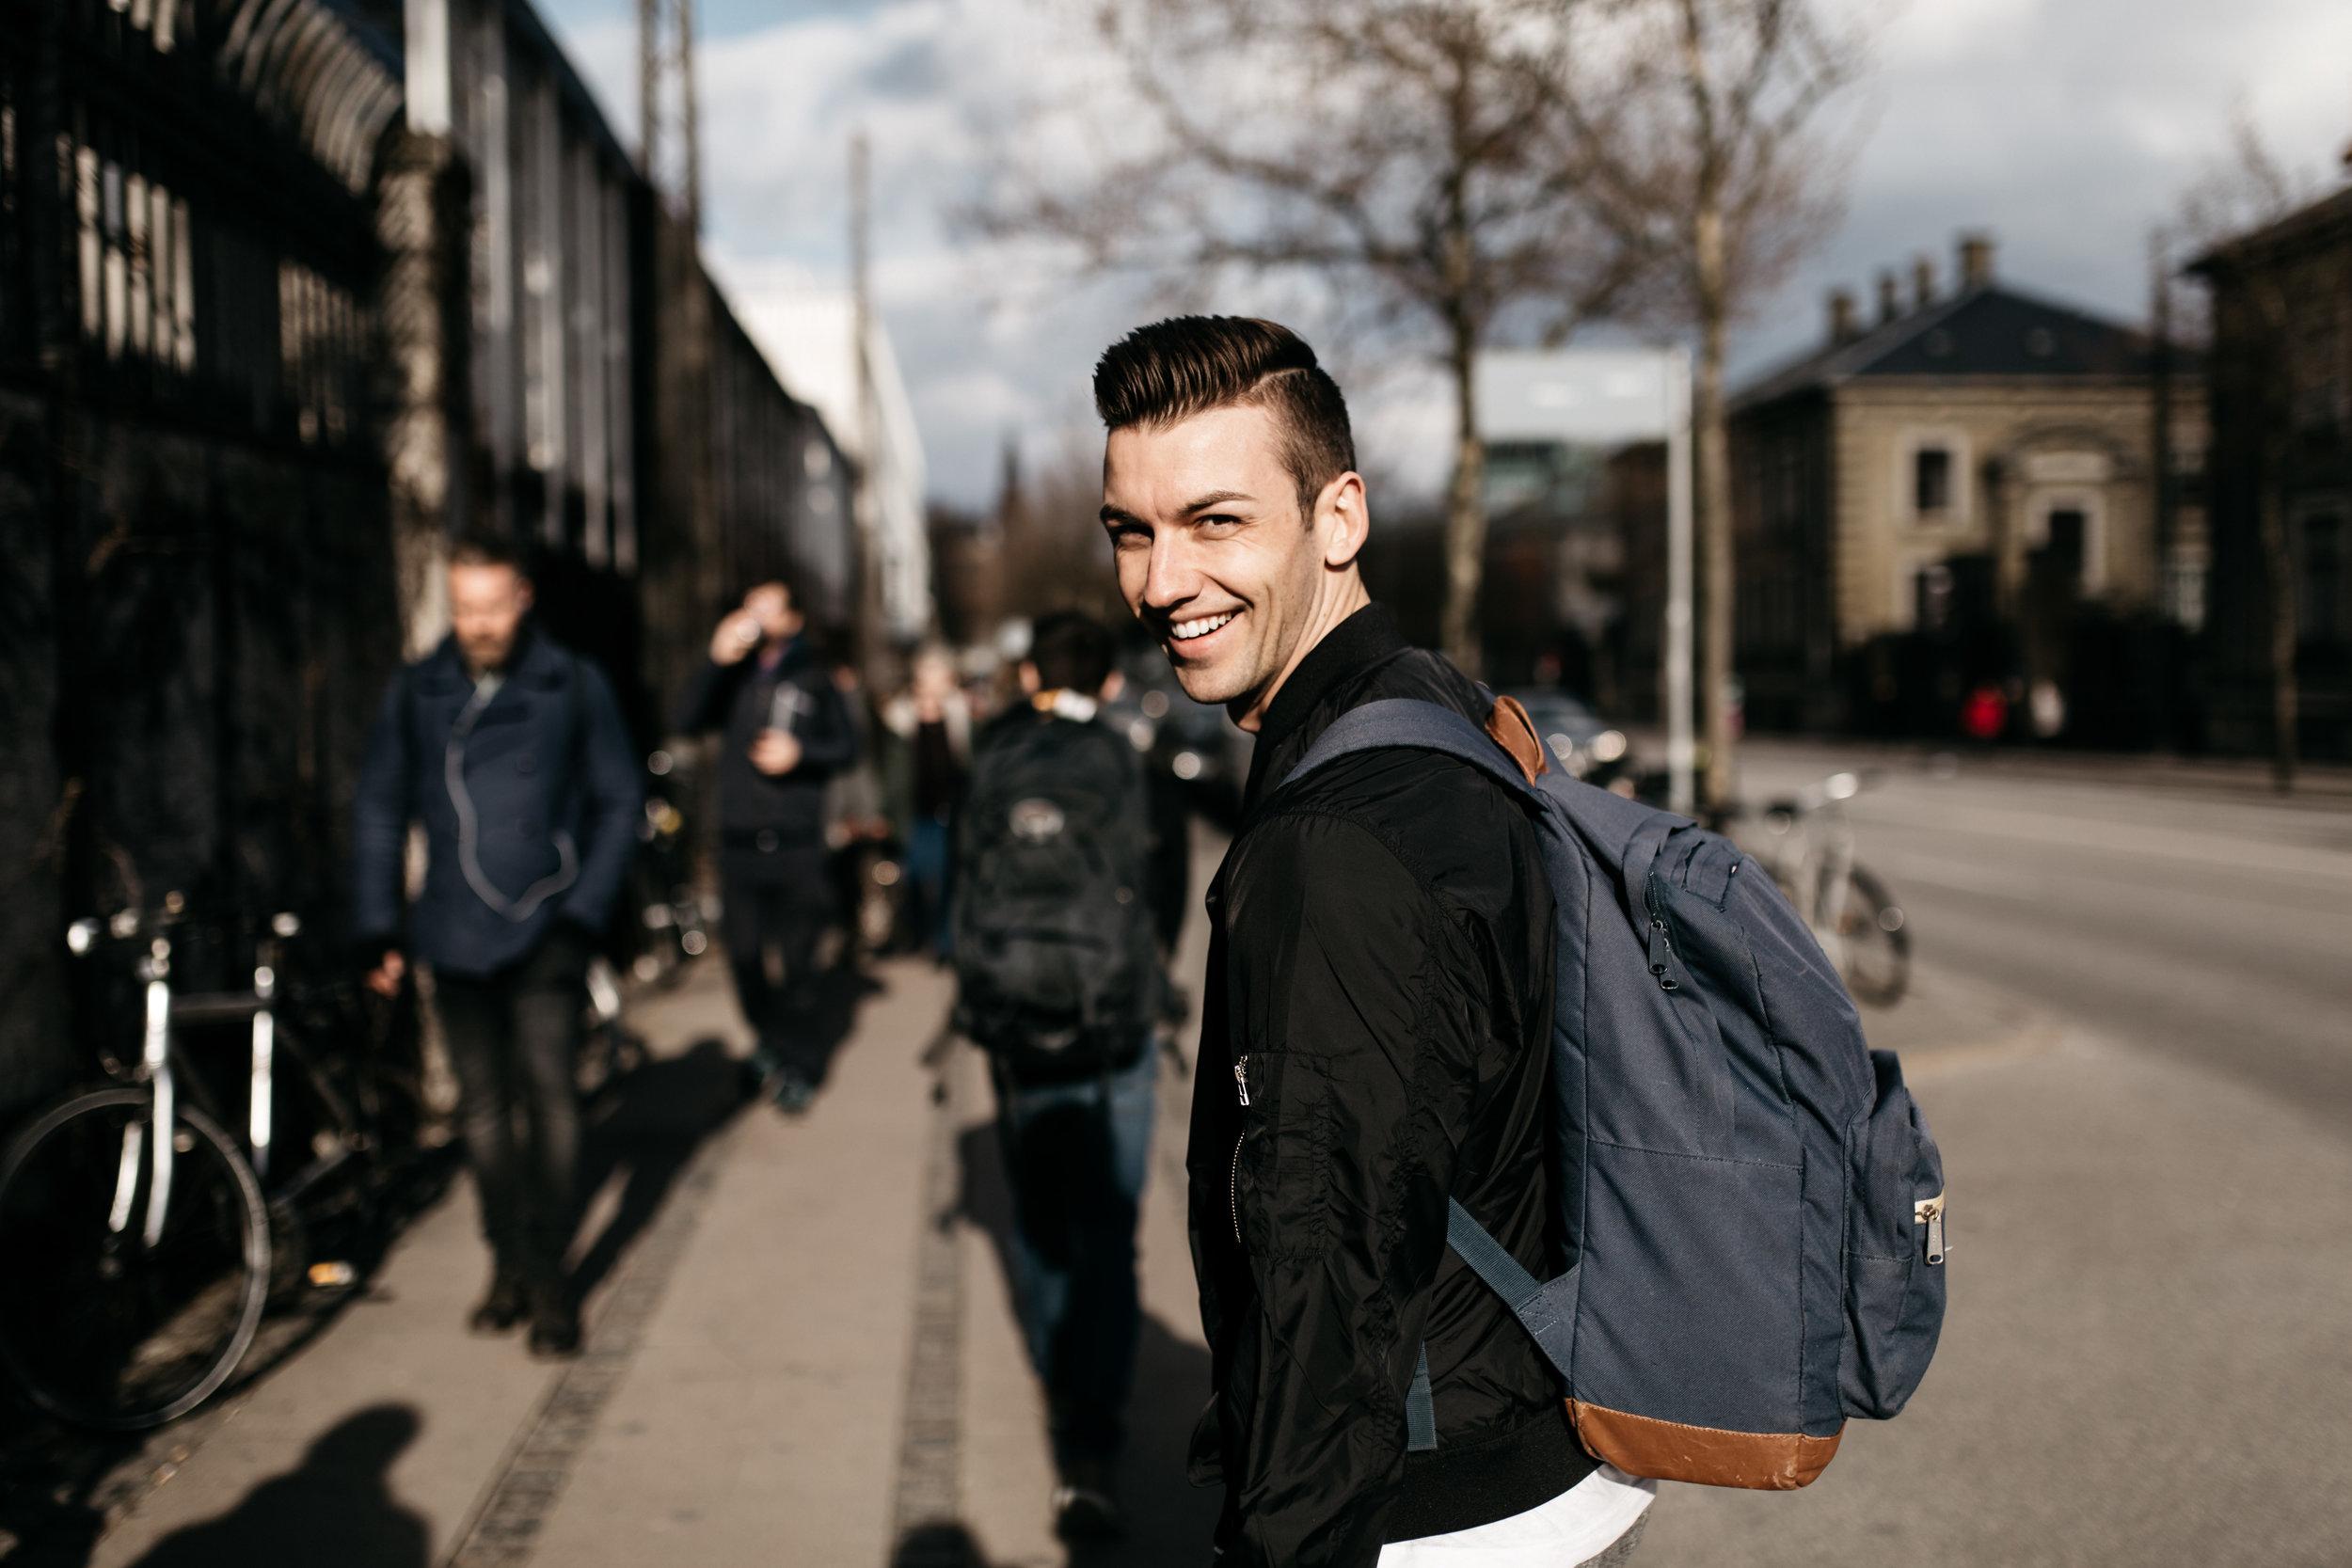 Michael walking in Copenhagen